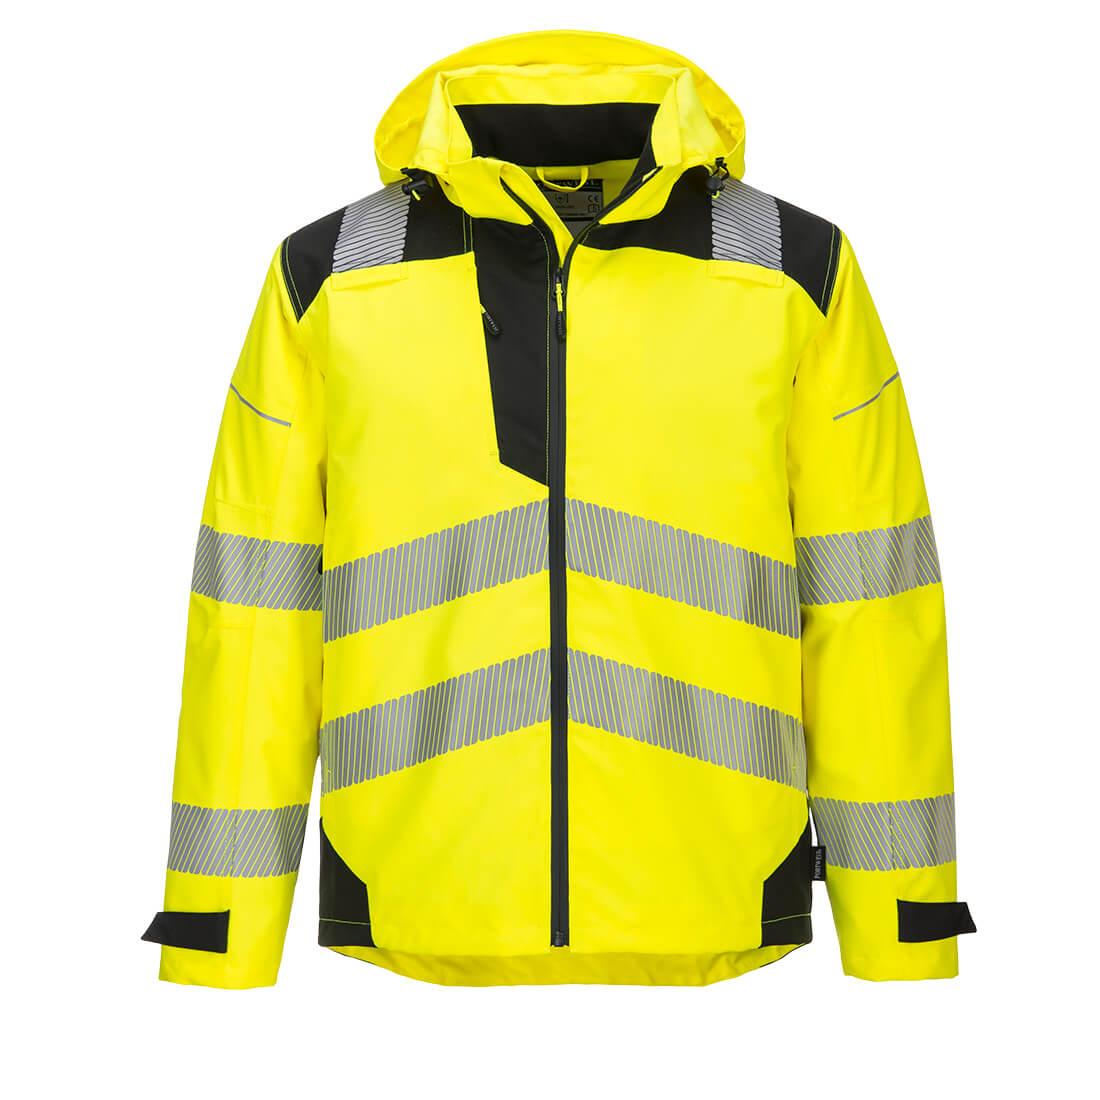 PW3 Extreme Breathable Rain Jacket Yellow/Black XL